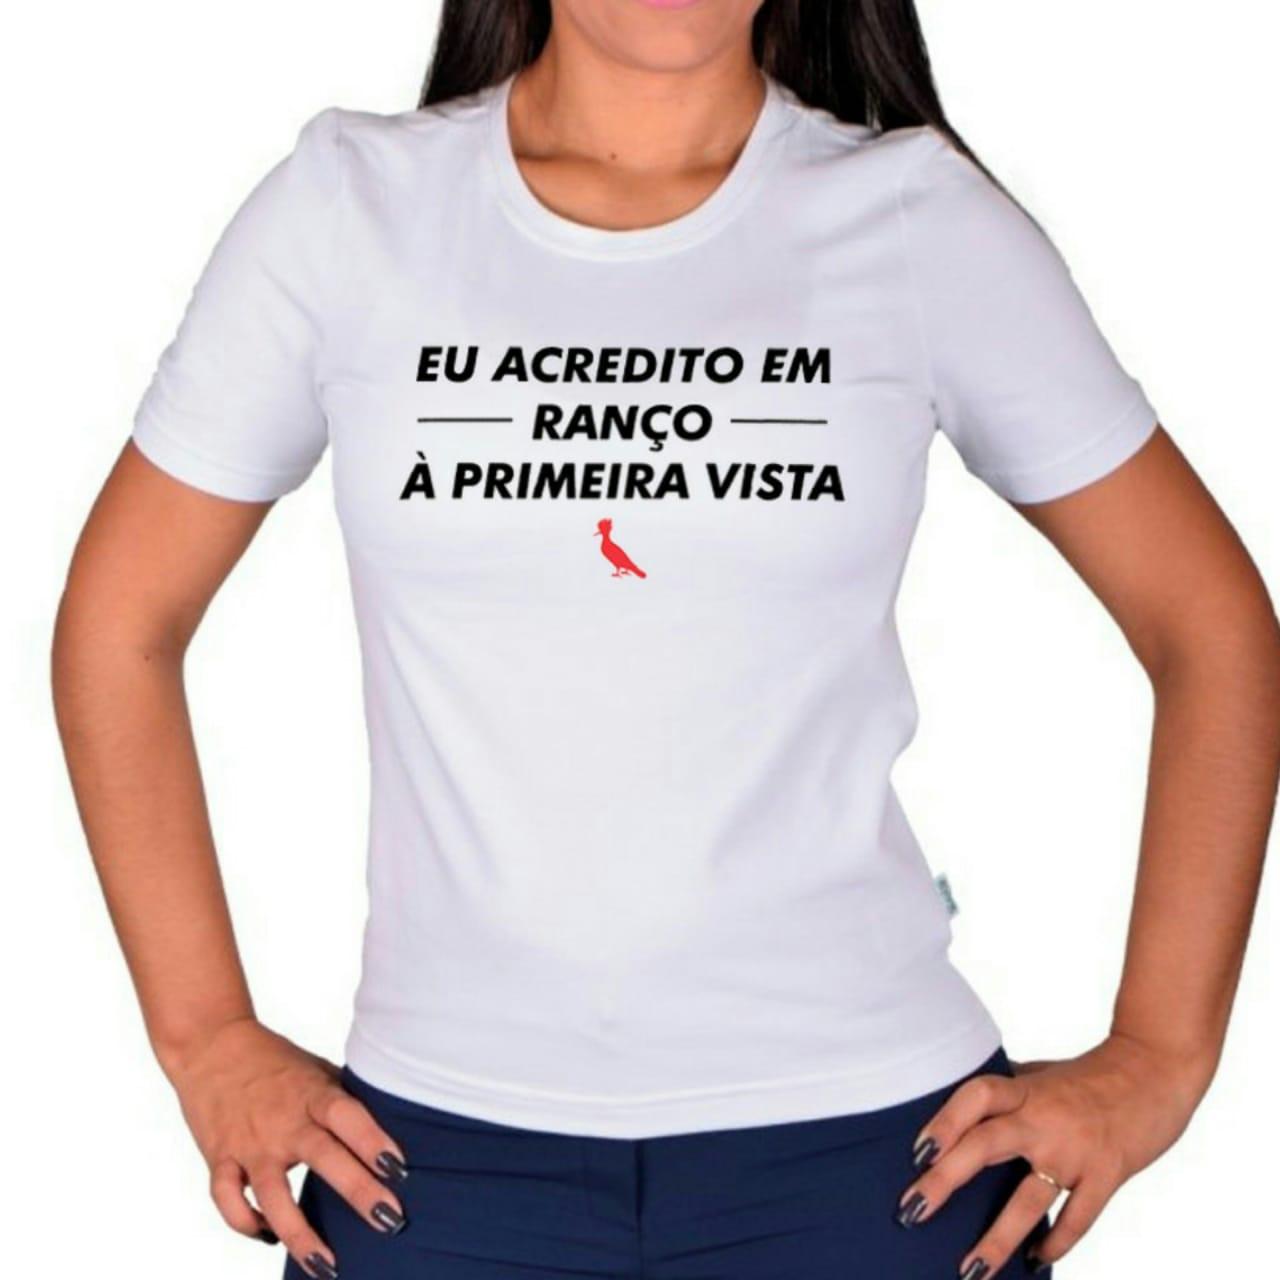 BABY LOOK 100% ALGODÃO PENTEADO BRANCA MARCA RANÇO PERSONALIZADA - FIO 30/1 - 160 DE GRAMATURA